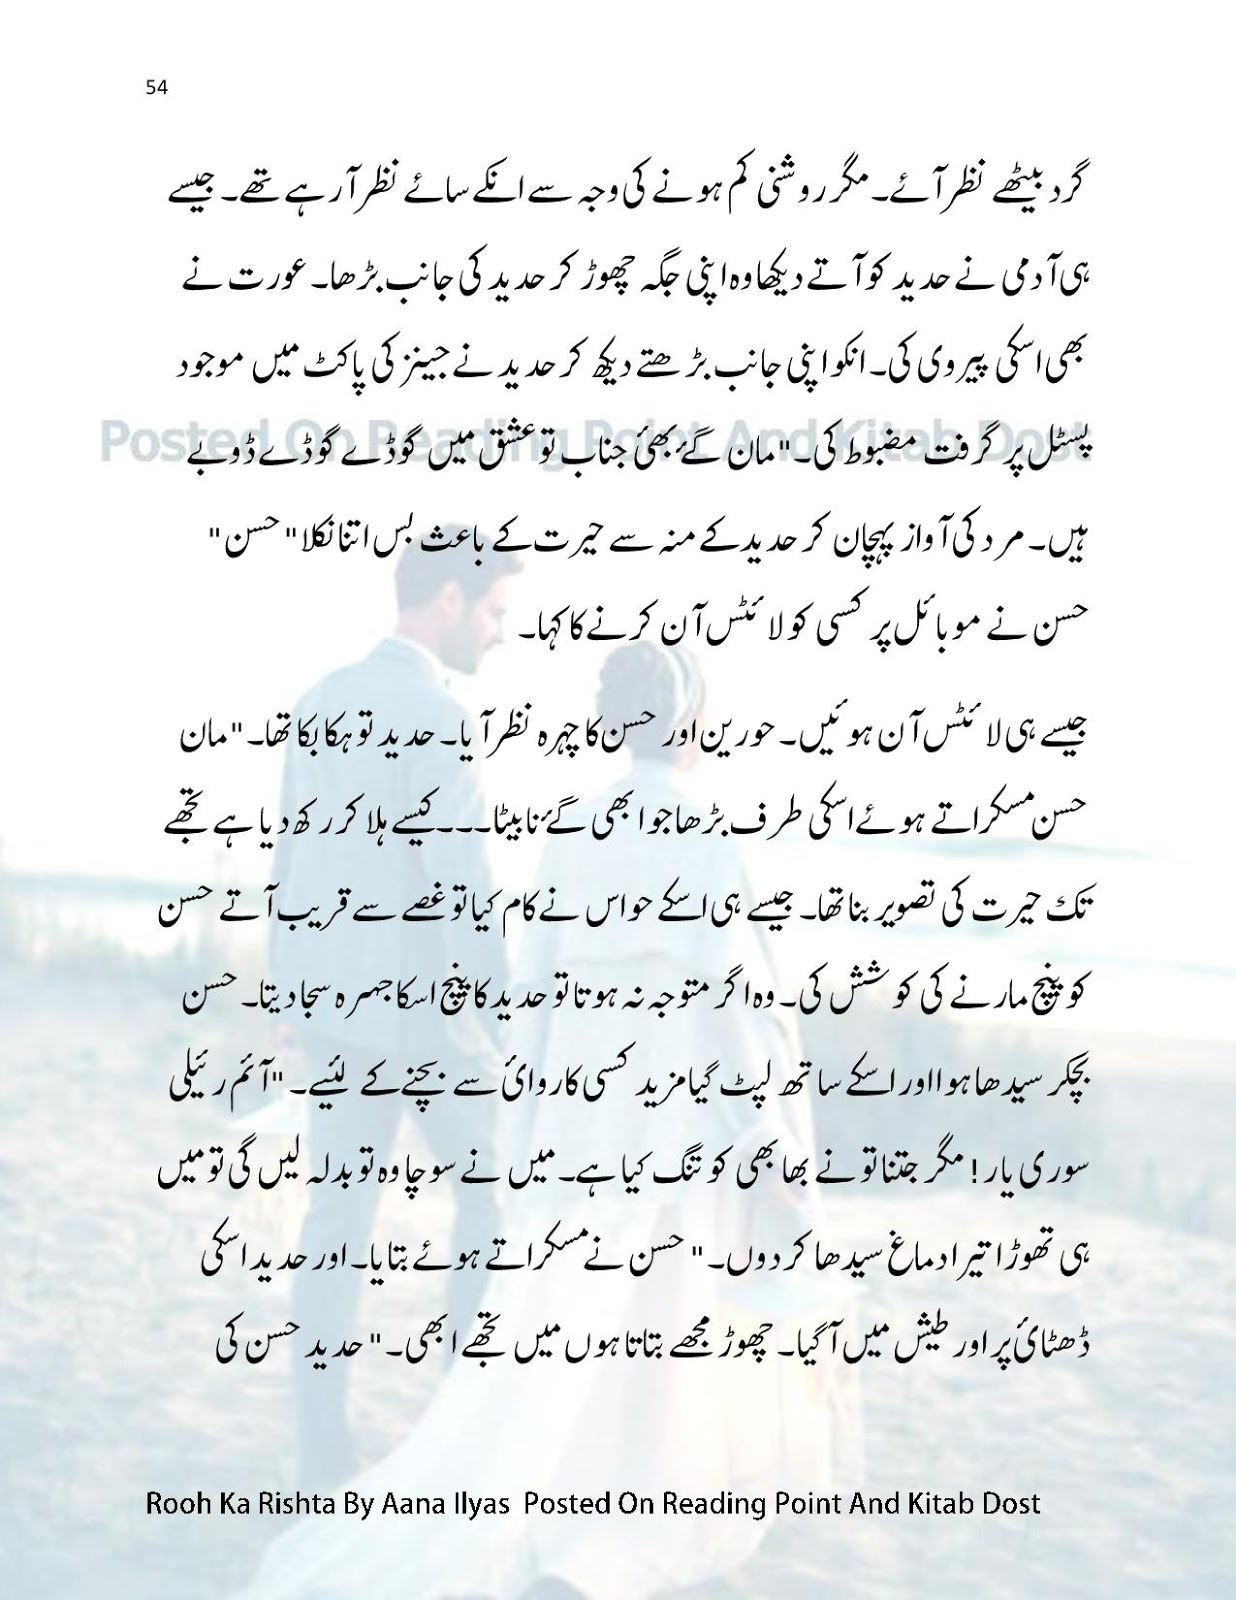 Rooh Ka Rishta By Ana Ilyas Forced Marriage Romance Novel